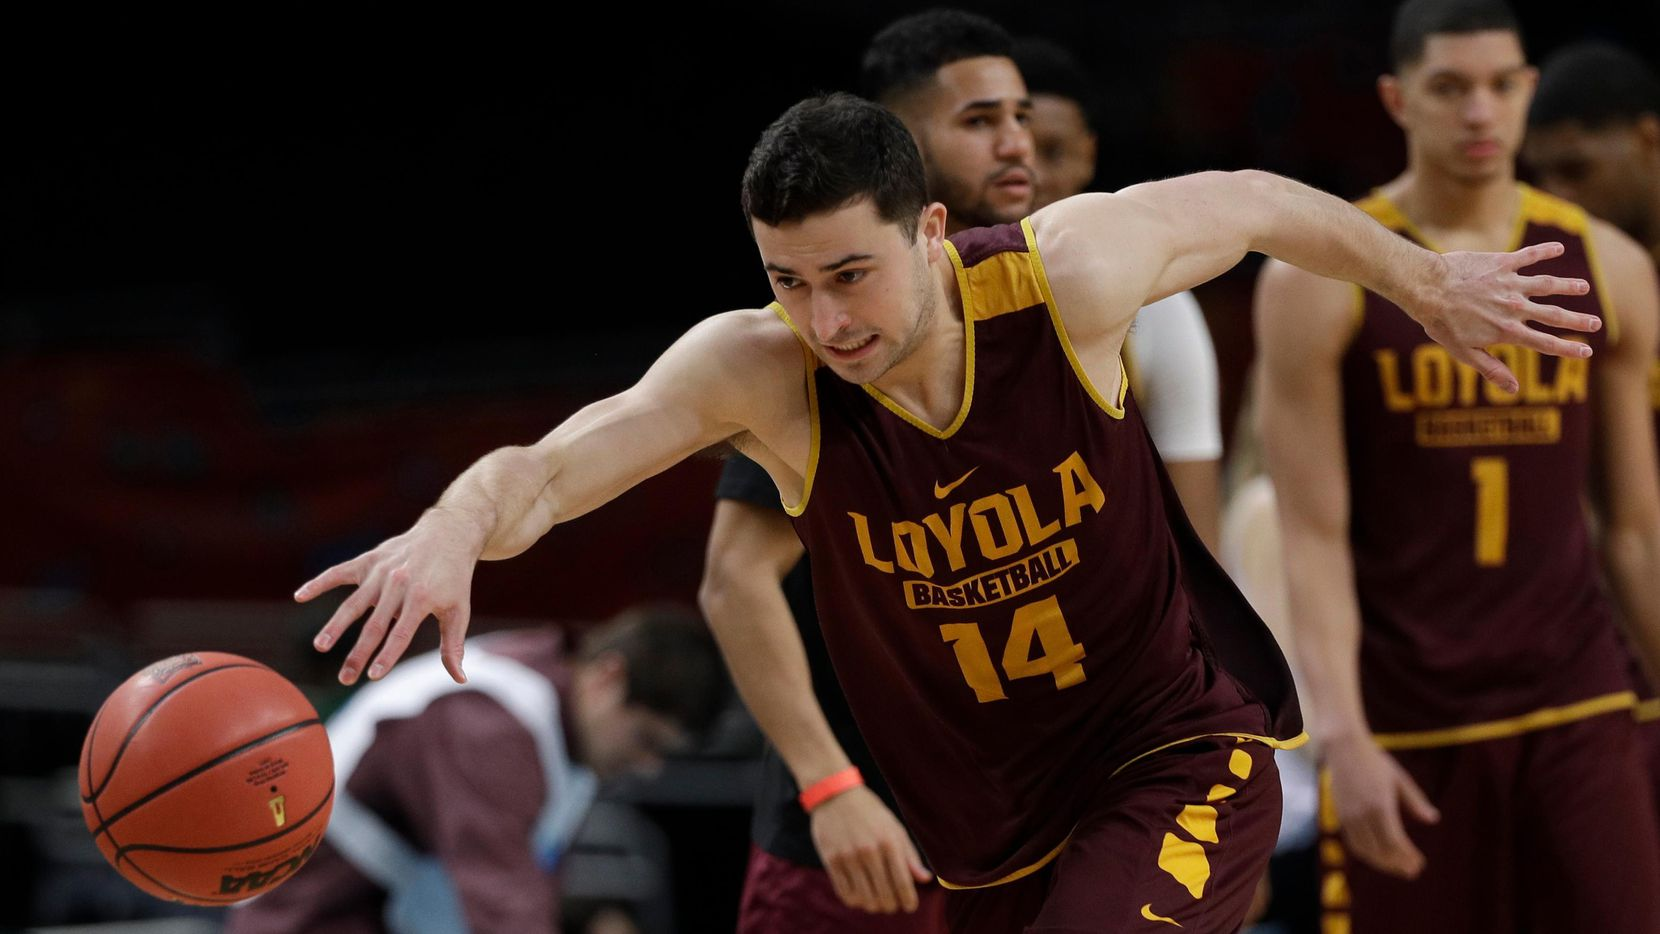 Ben Richardson (14) y Loyola-Chicago se colaron al Final Four de la NCAA. (AP/David J. Phillip)